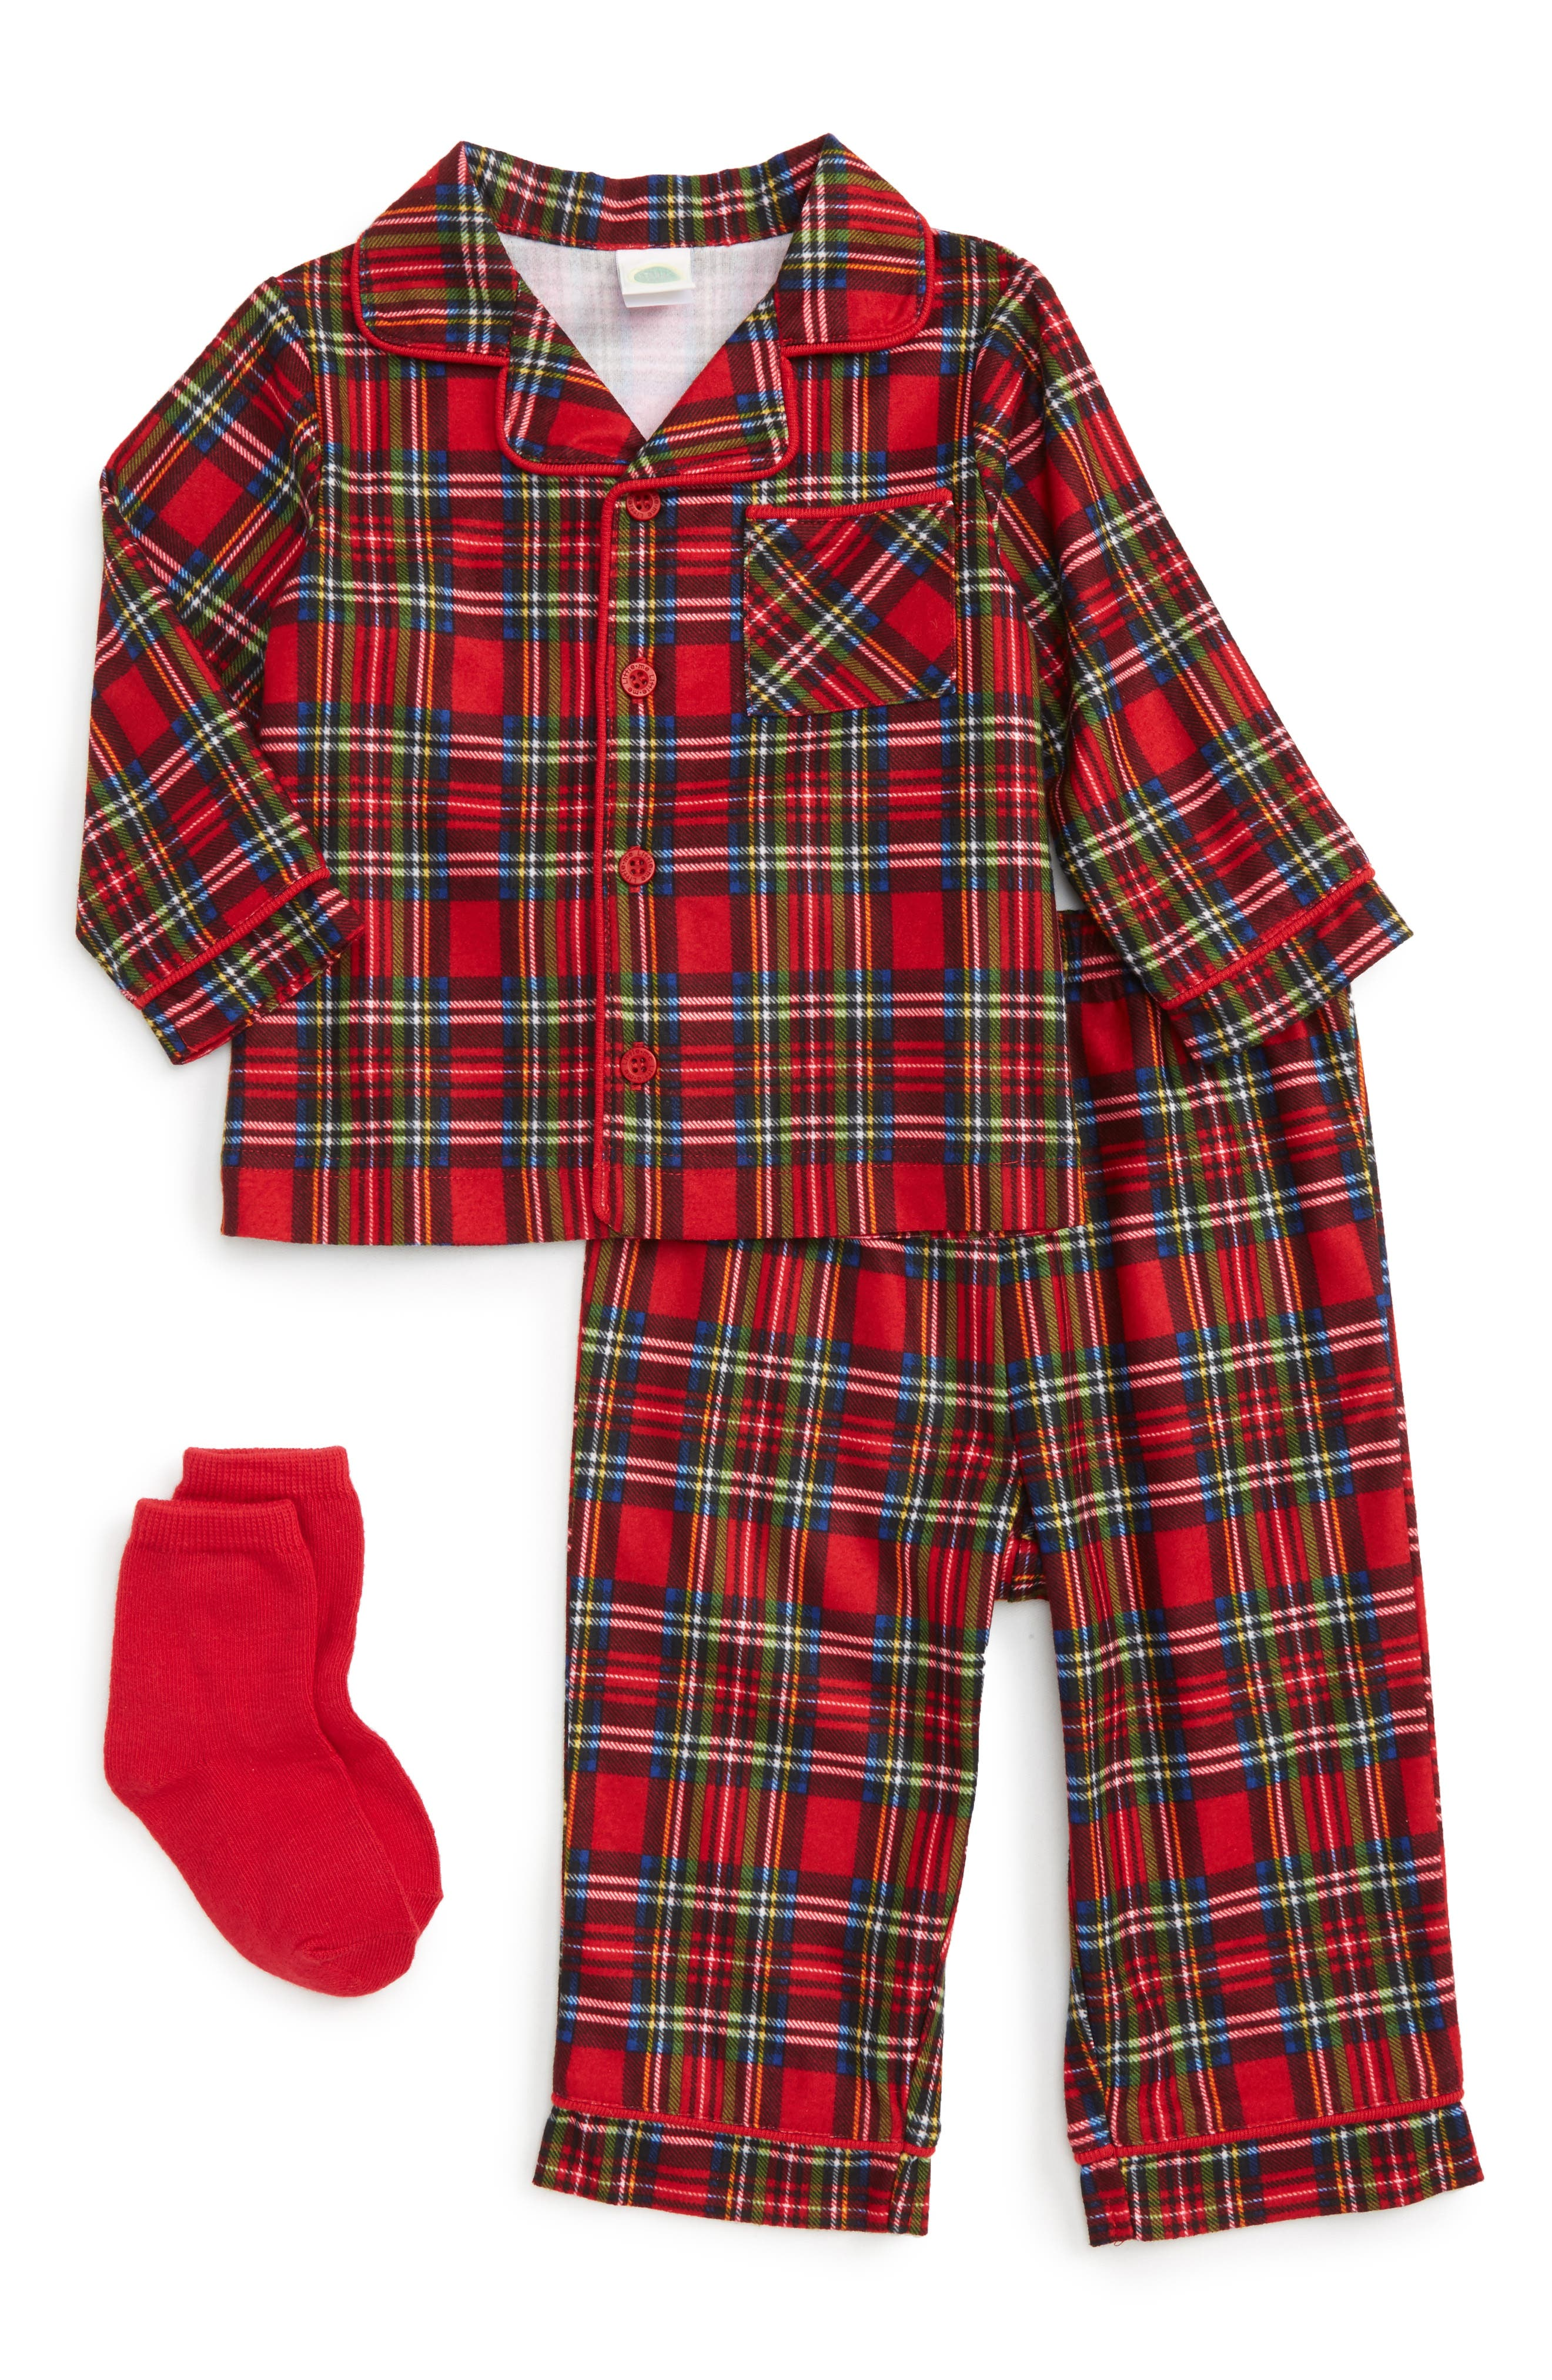 Two-Piece Pajamas & Socks Set,                             Main thumbnail 1, color,                             600